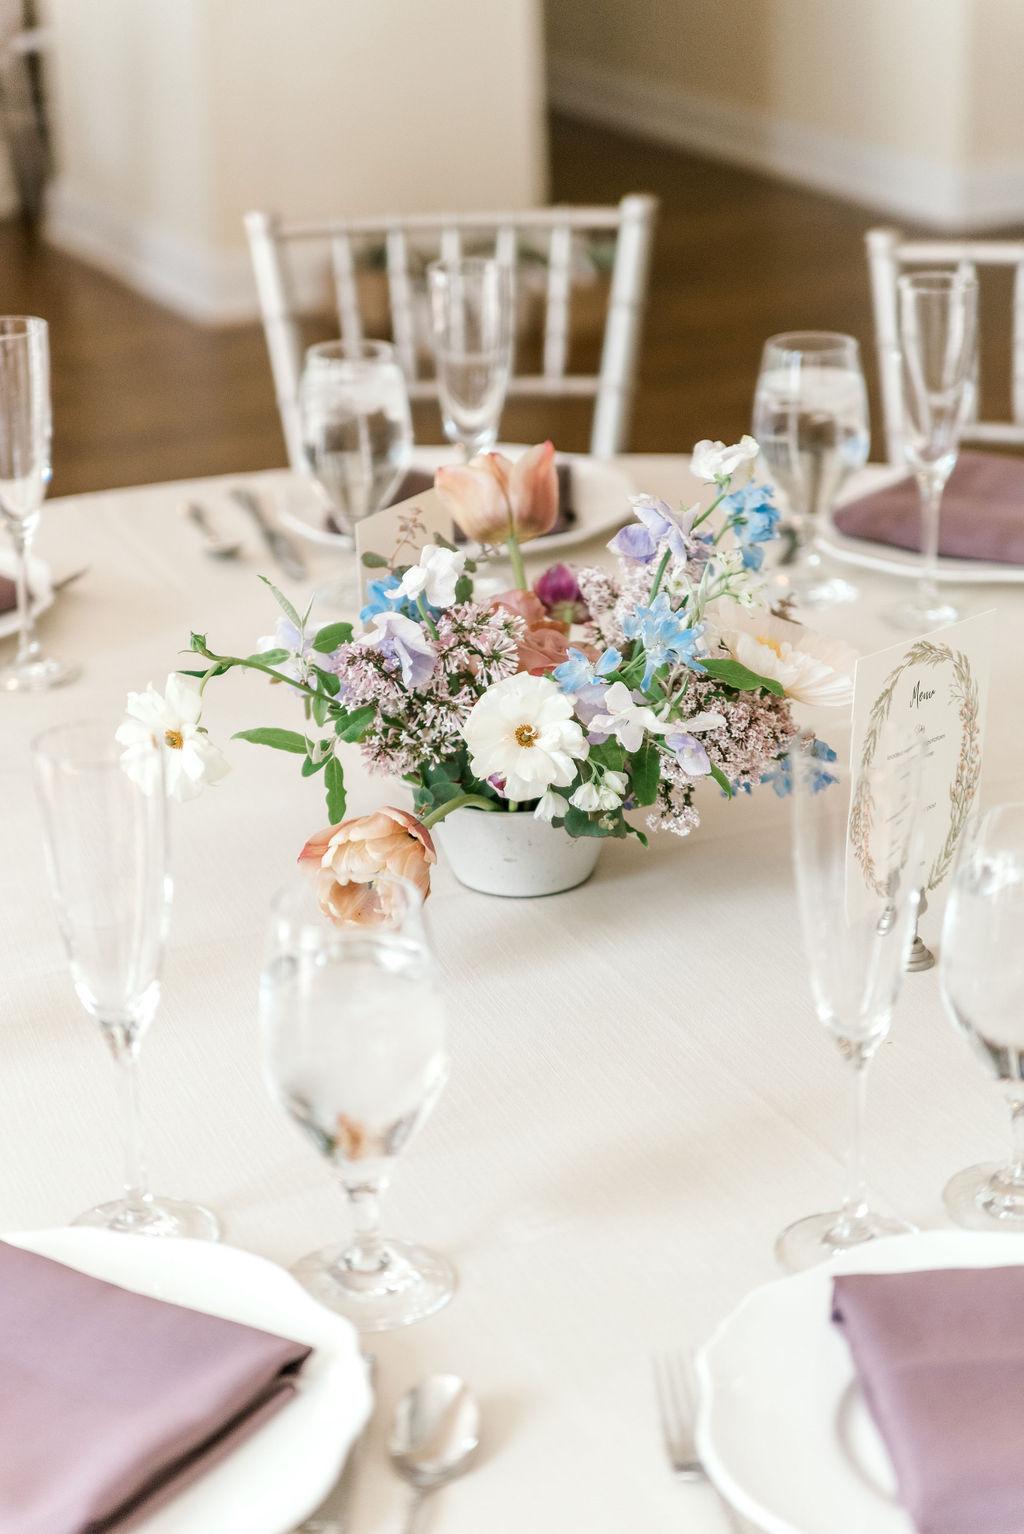 evergreen-flower-co-wedding-centerpiece-estate-at-sunset-farms-wedding-planner.jpg